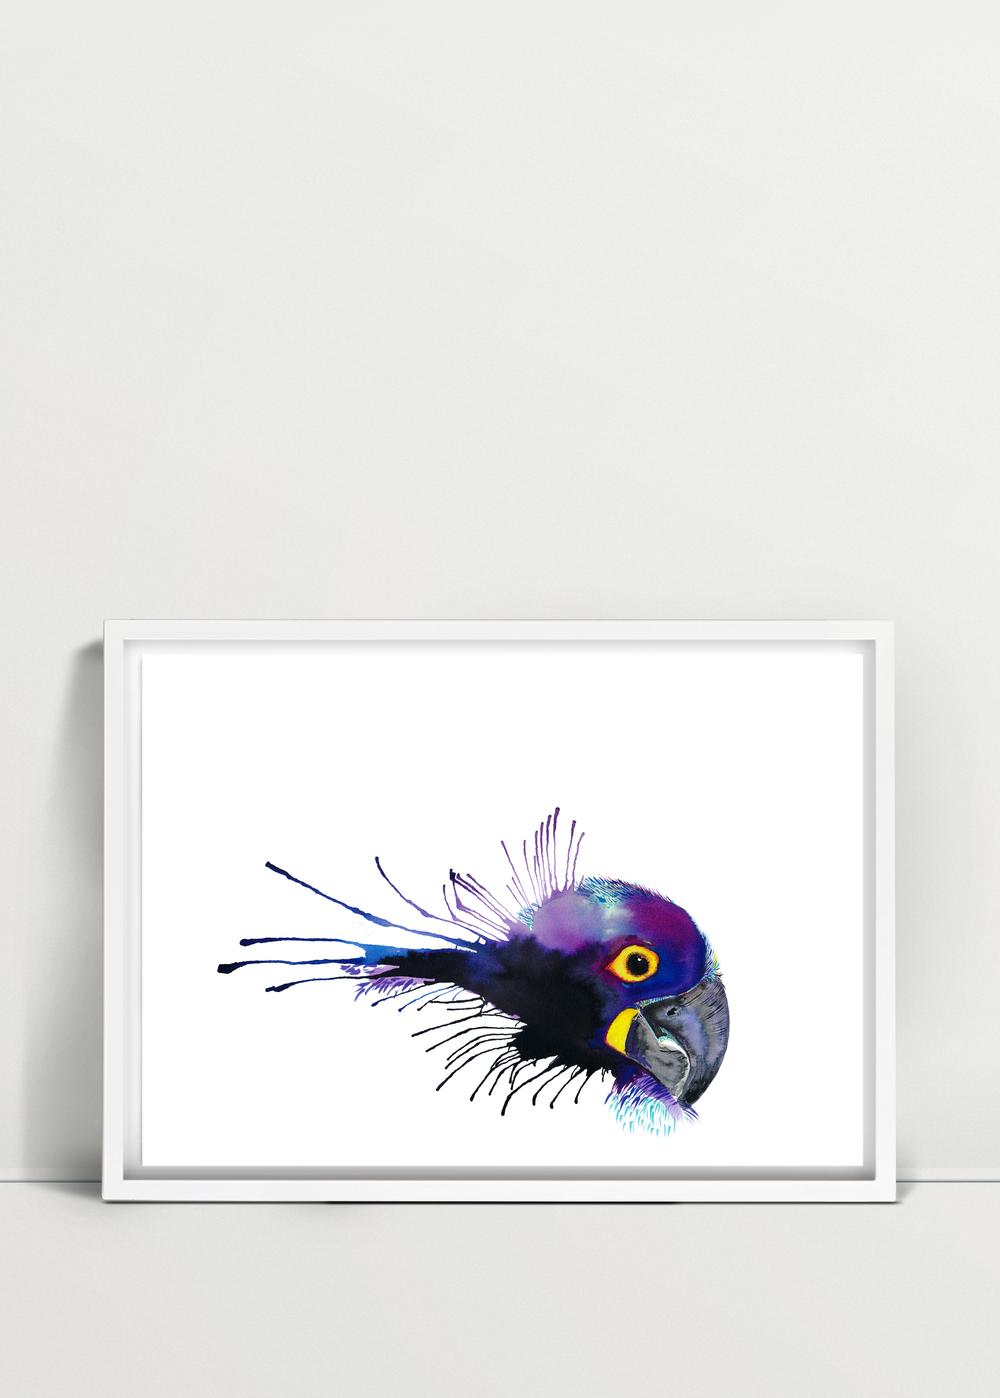 Parrot_03.png